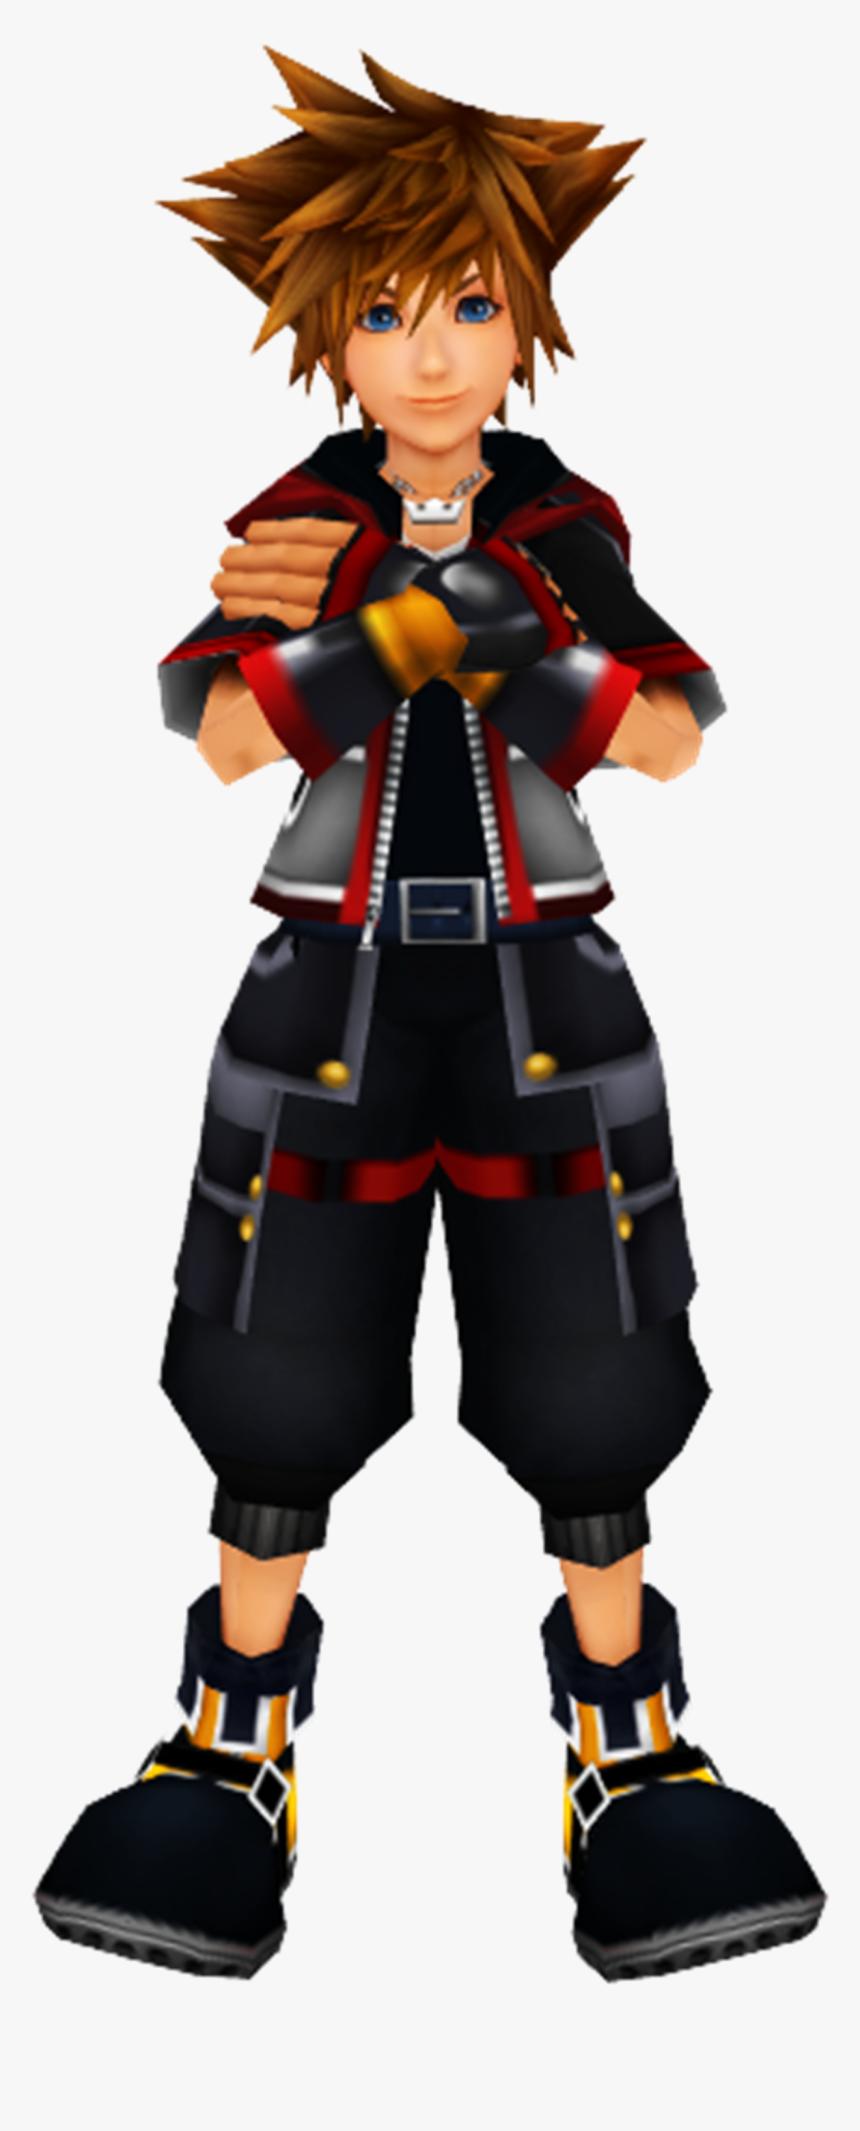 Sora Kingdom Hearts Iii - Kingdom Hearts 3 Main Character, HD Png Download, Free Download